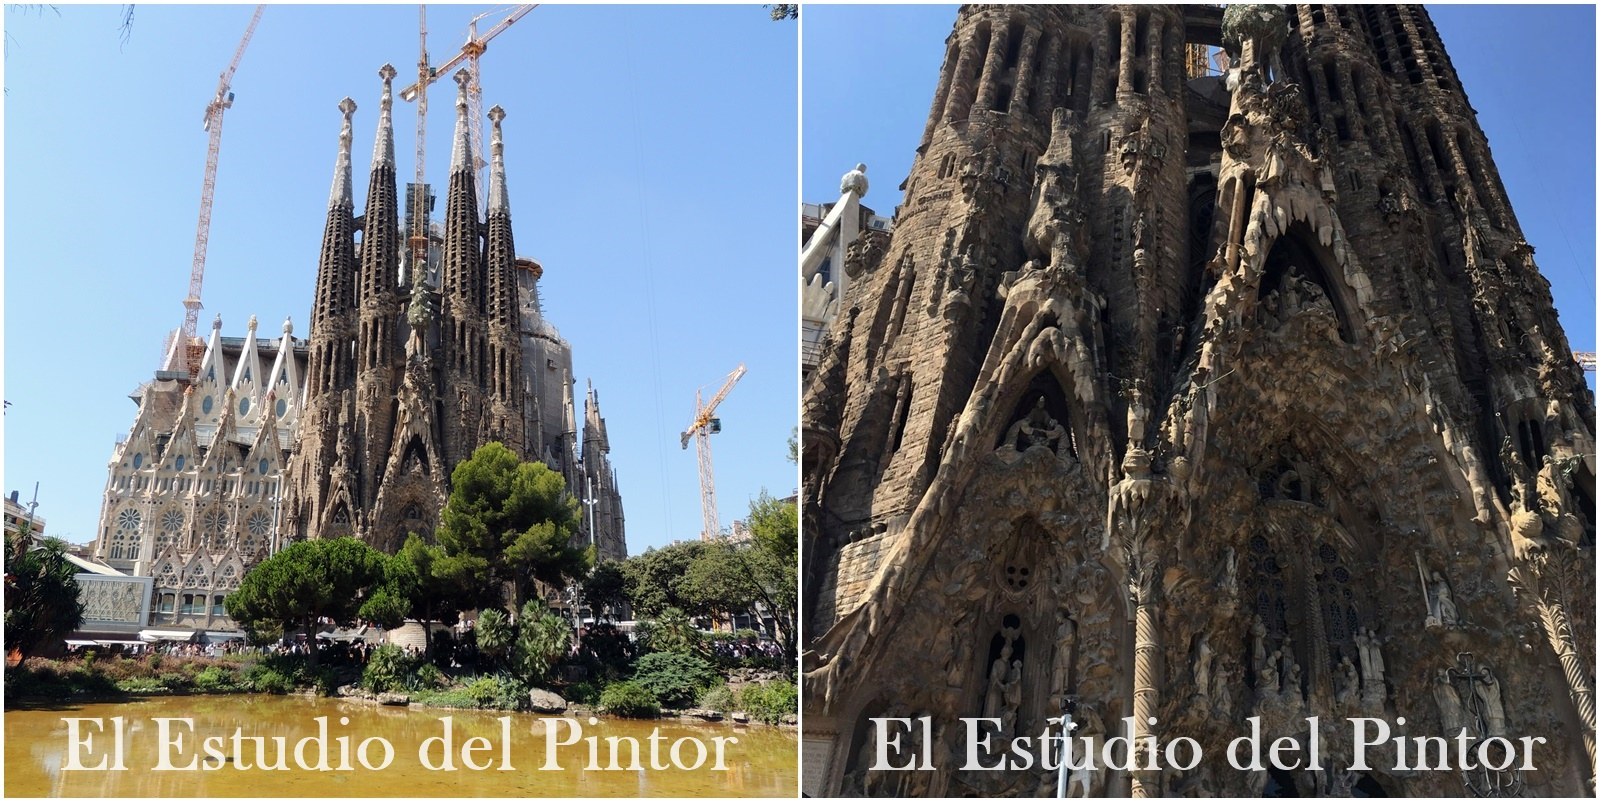 1. Sagrada Familia, Gaudí